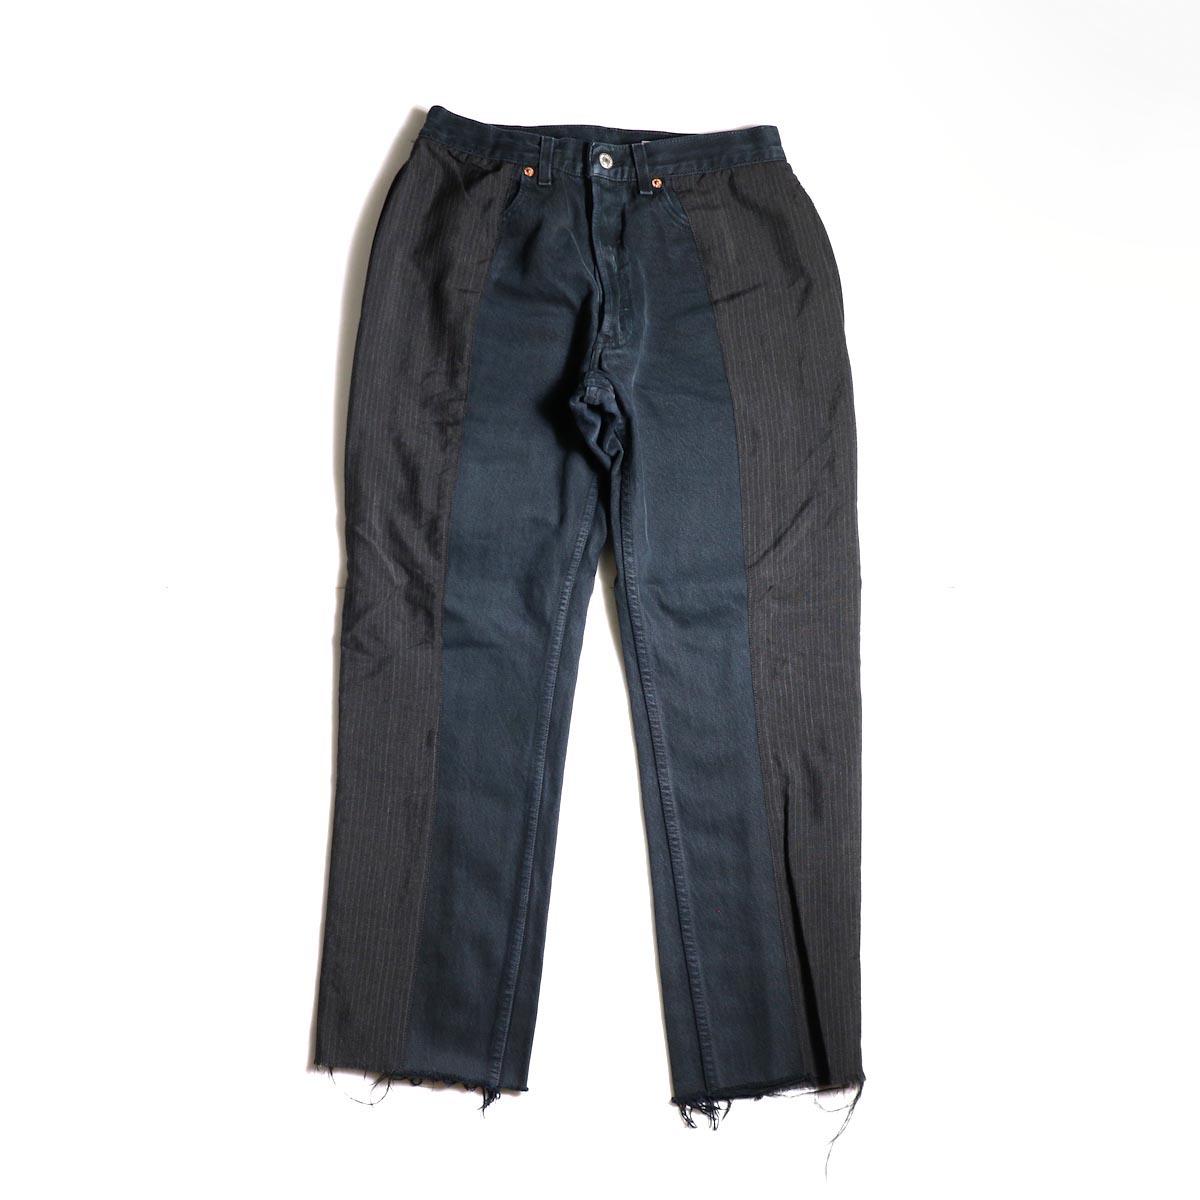 OLD PARK / Docking Jeans Black (Ssize-B)正面